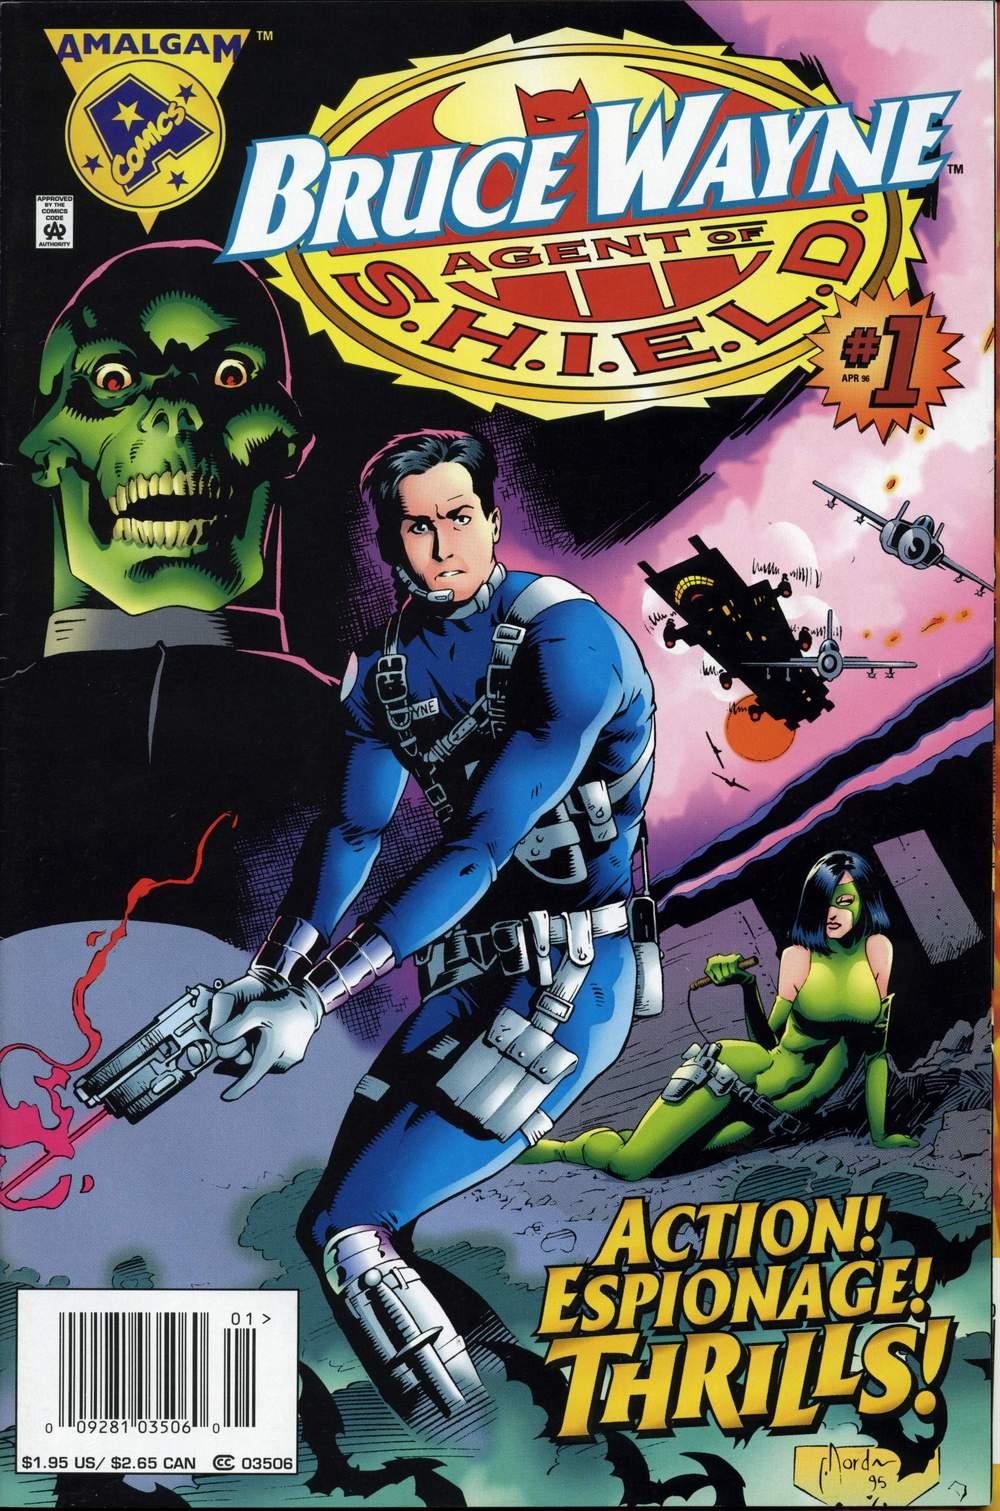 Amalgam' 03 06) Bruce Wayne, Agent of S H I E L D  V1996